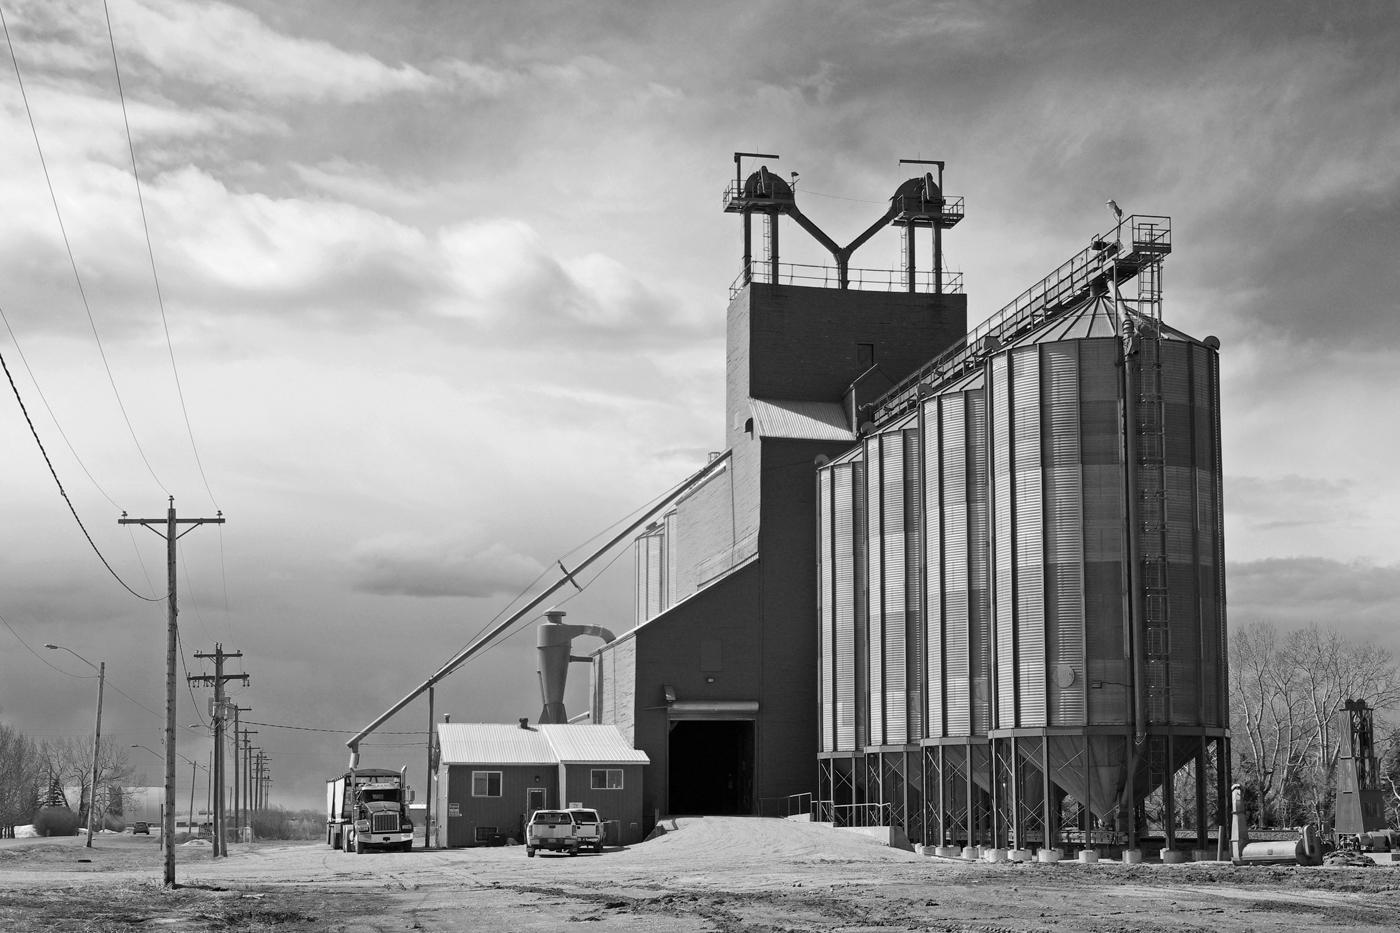 'Grain Silos' by Richard Ramsey